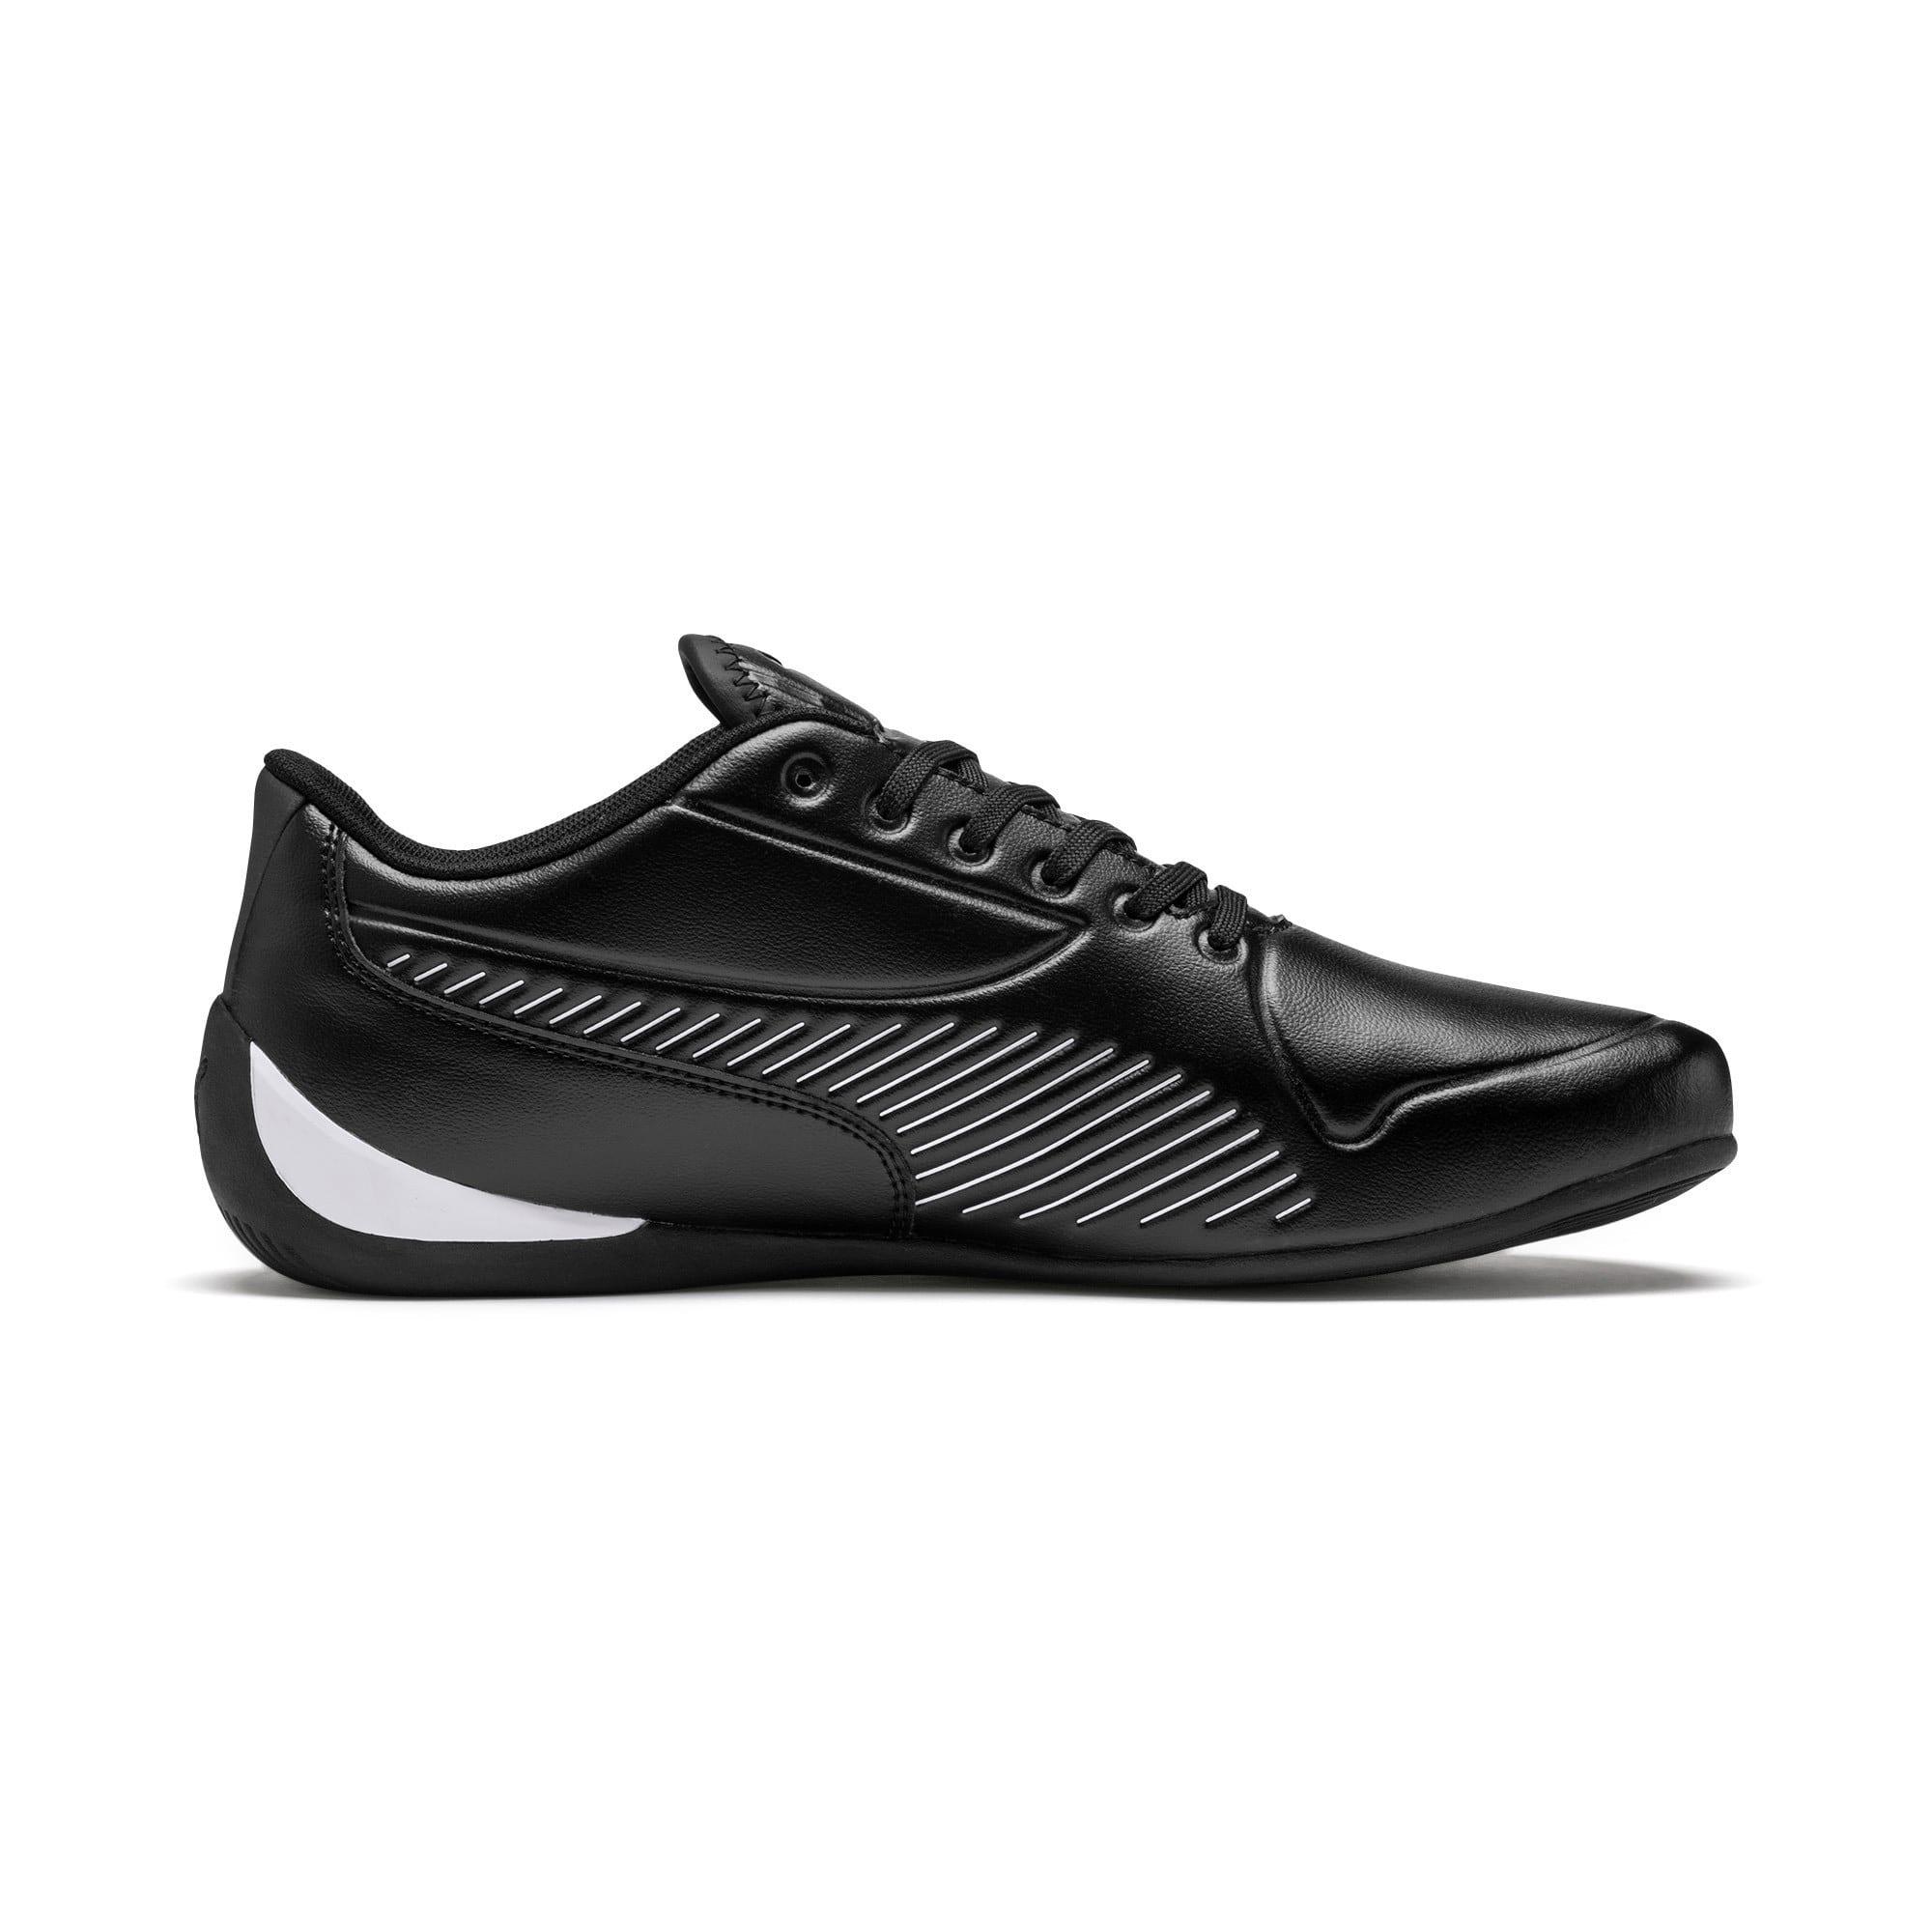 Thumbnail 6 of Scuderia Ferrari Drift Cat 7S Ultra Men's Shoes, Puma Black-Puma White, medium